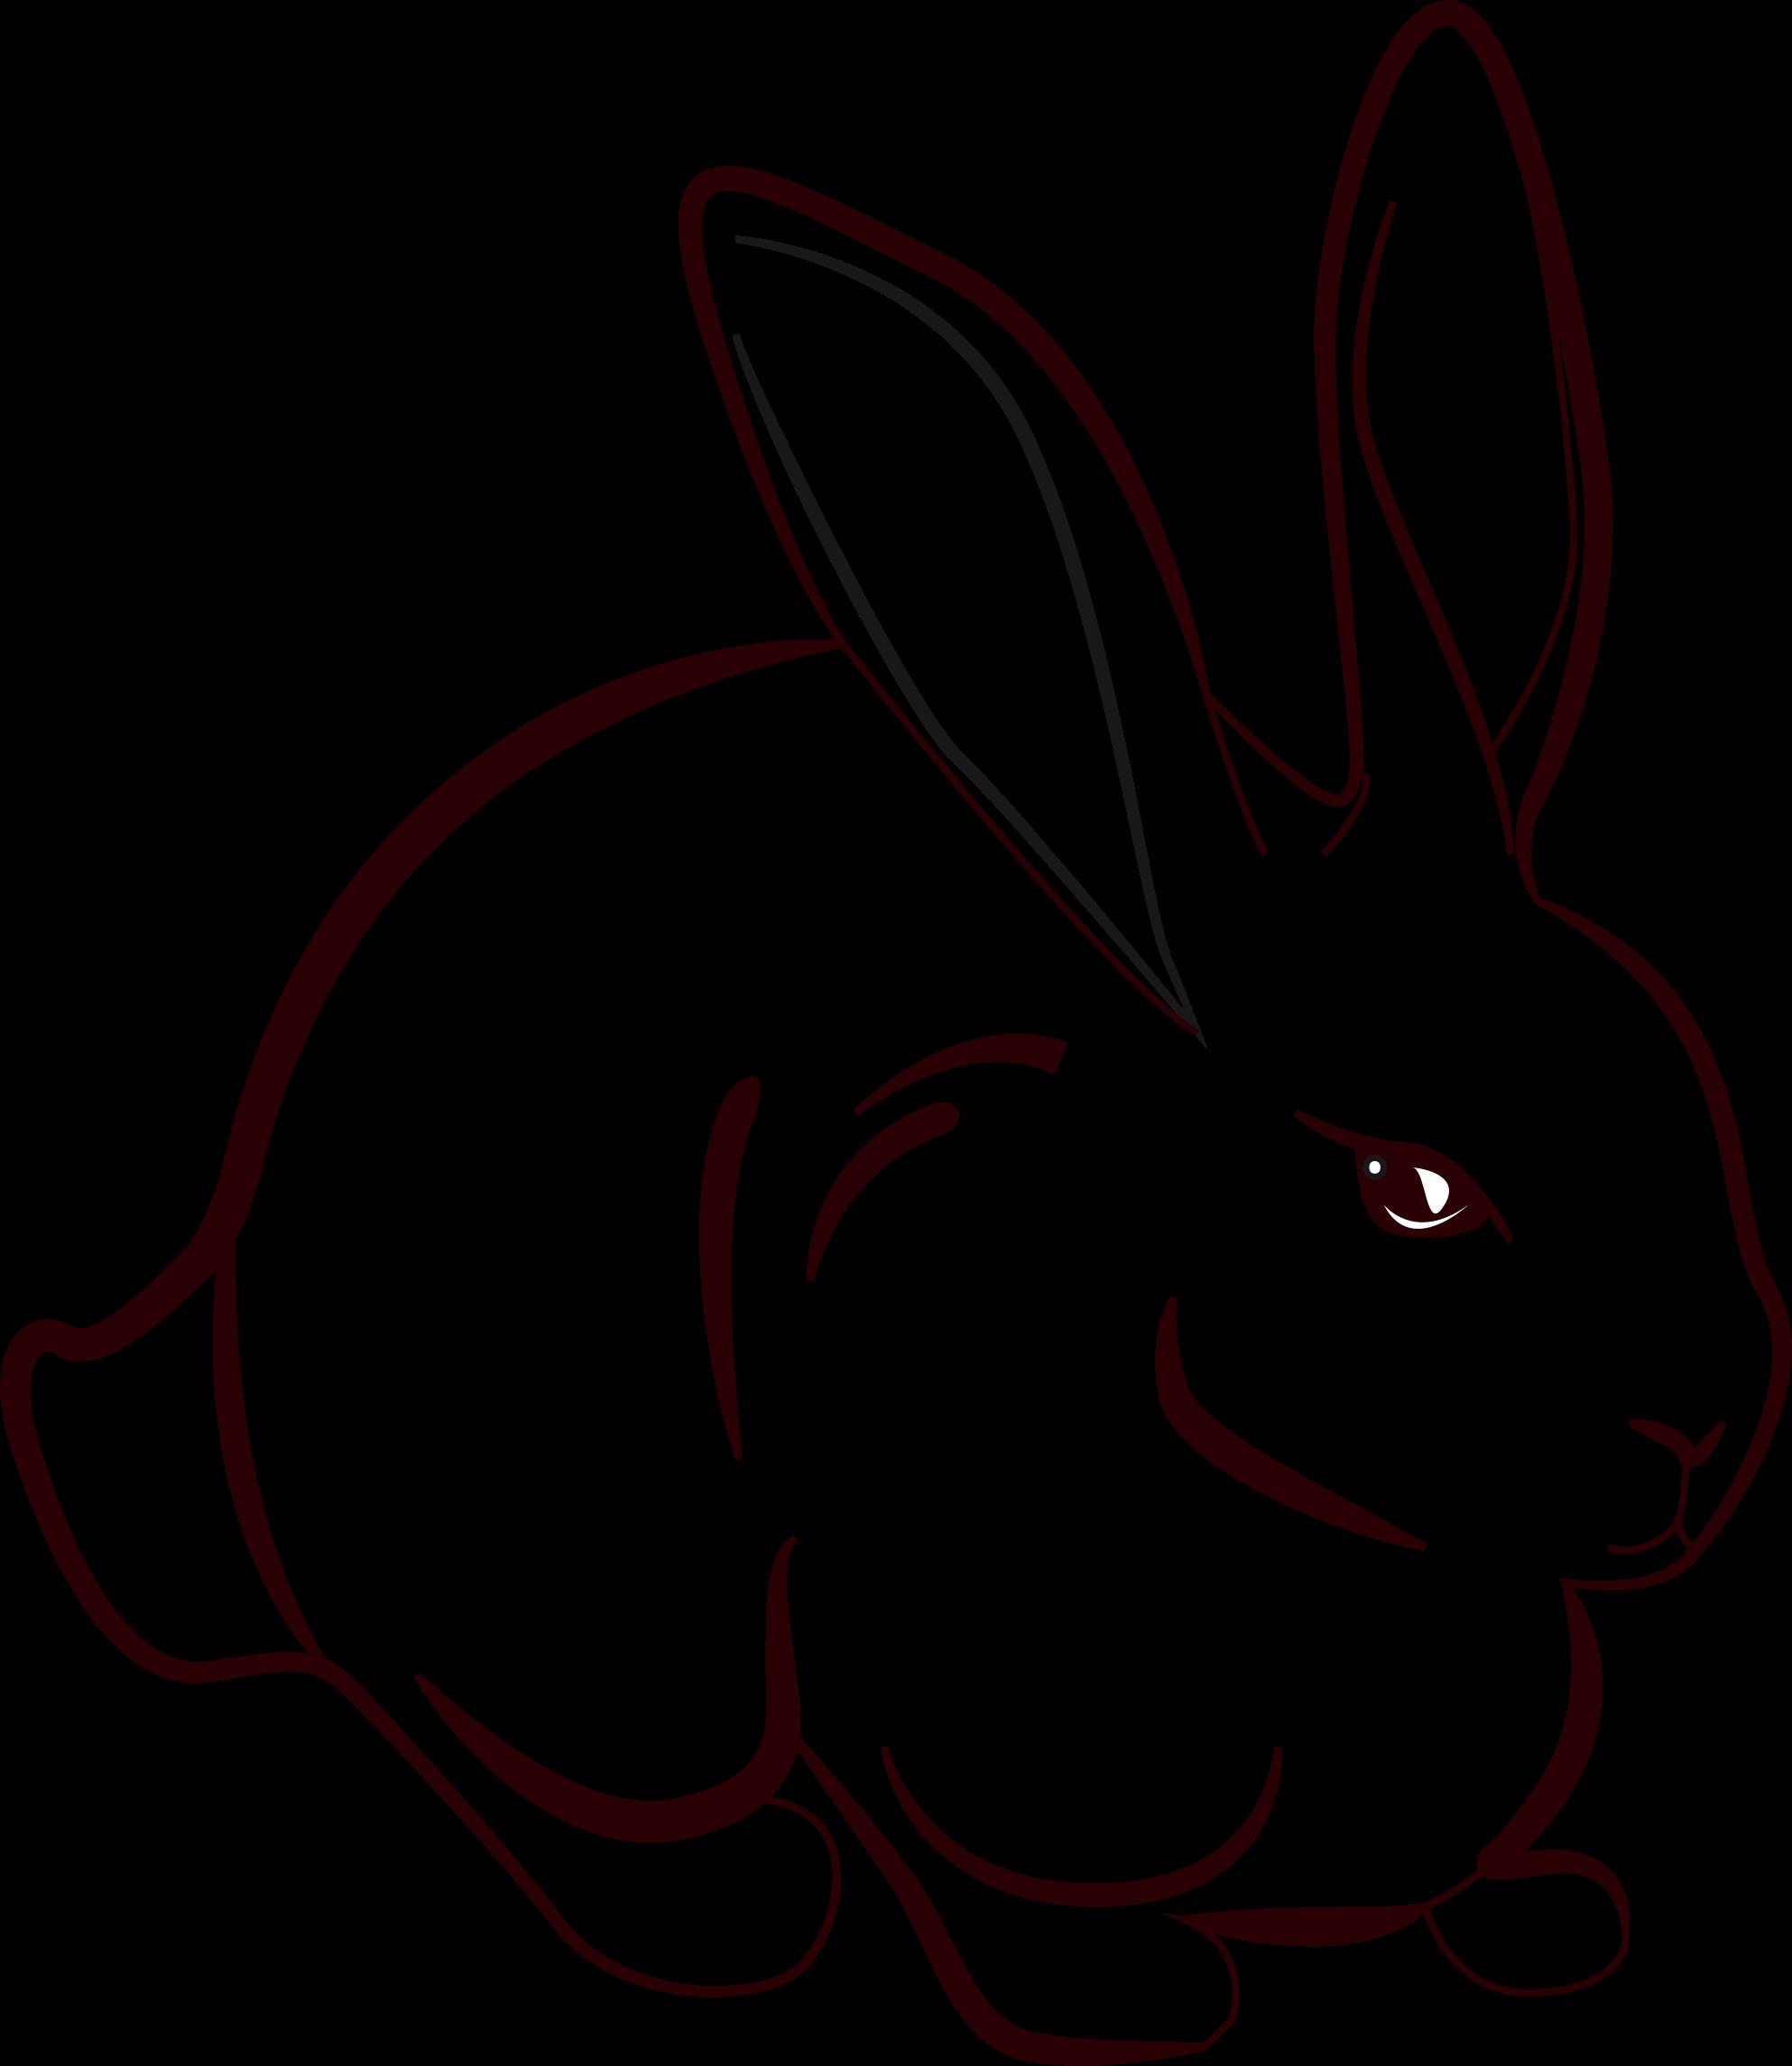 Group. Clipart rabbit line art